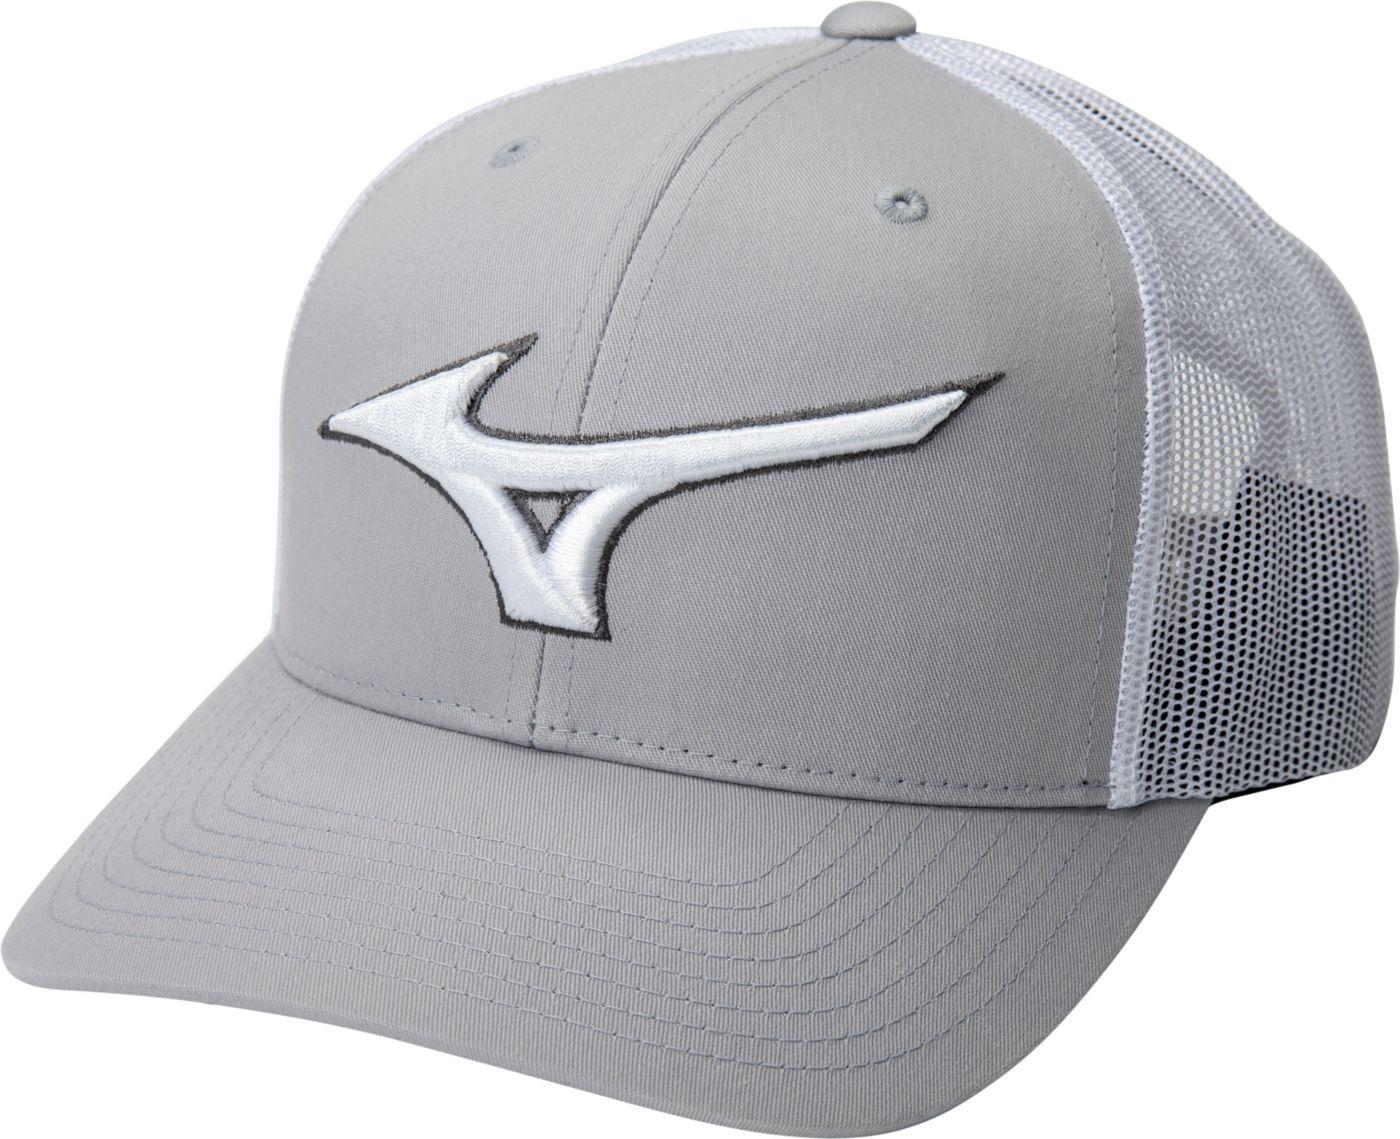 Mizuno Diamond Trucker Hat